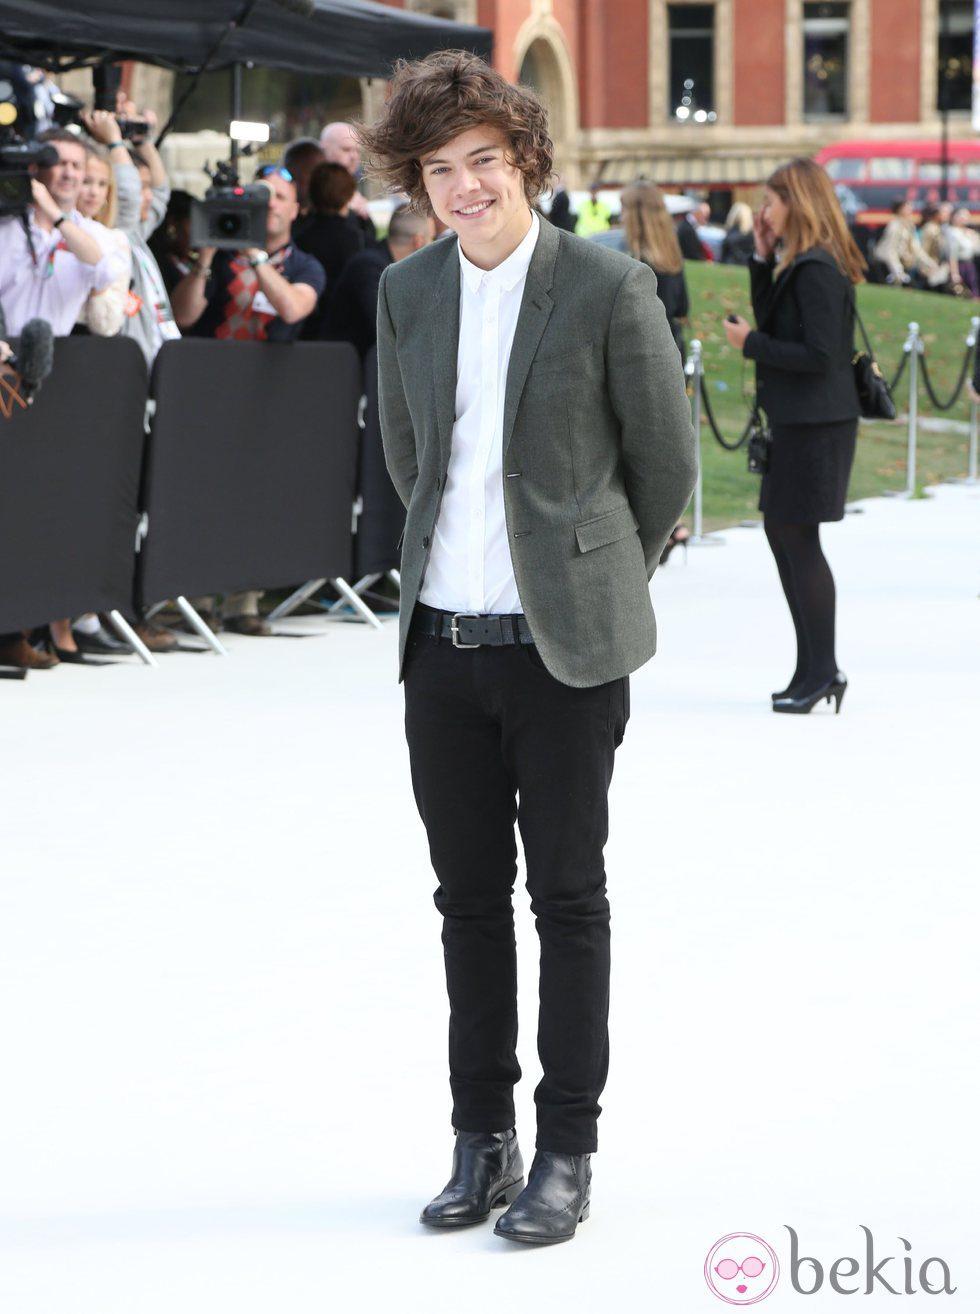 Harry Styles One Direction Wiki FANDOM powered by Wikia Harry styles at london fashion week